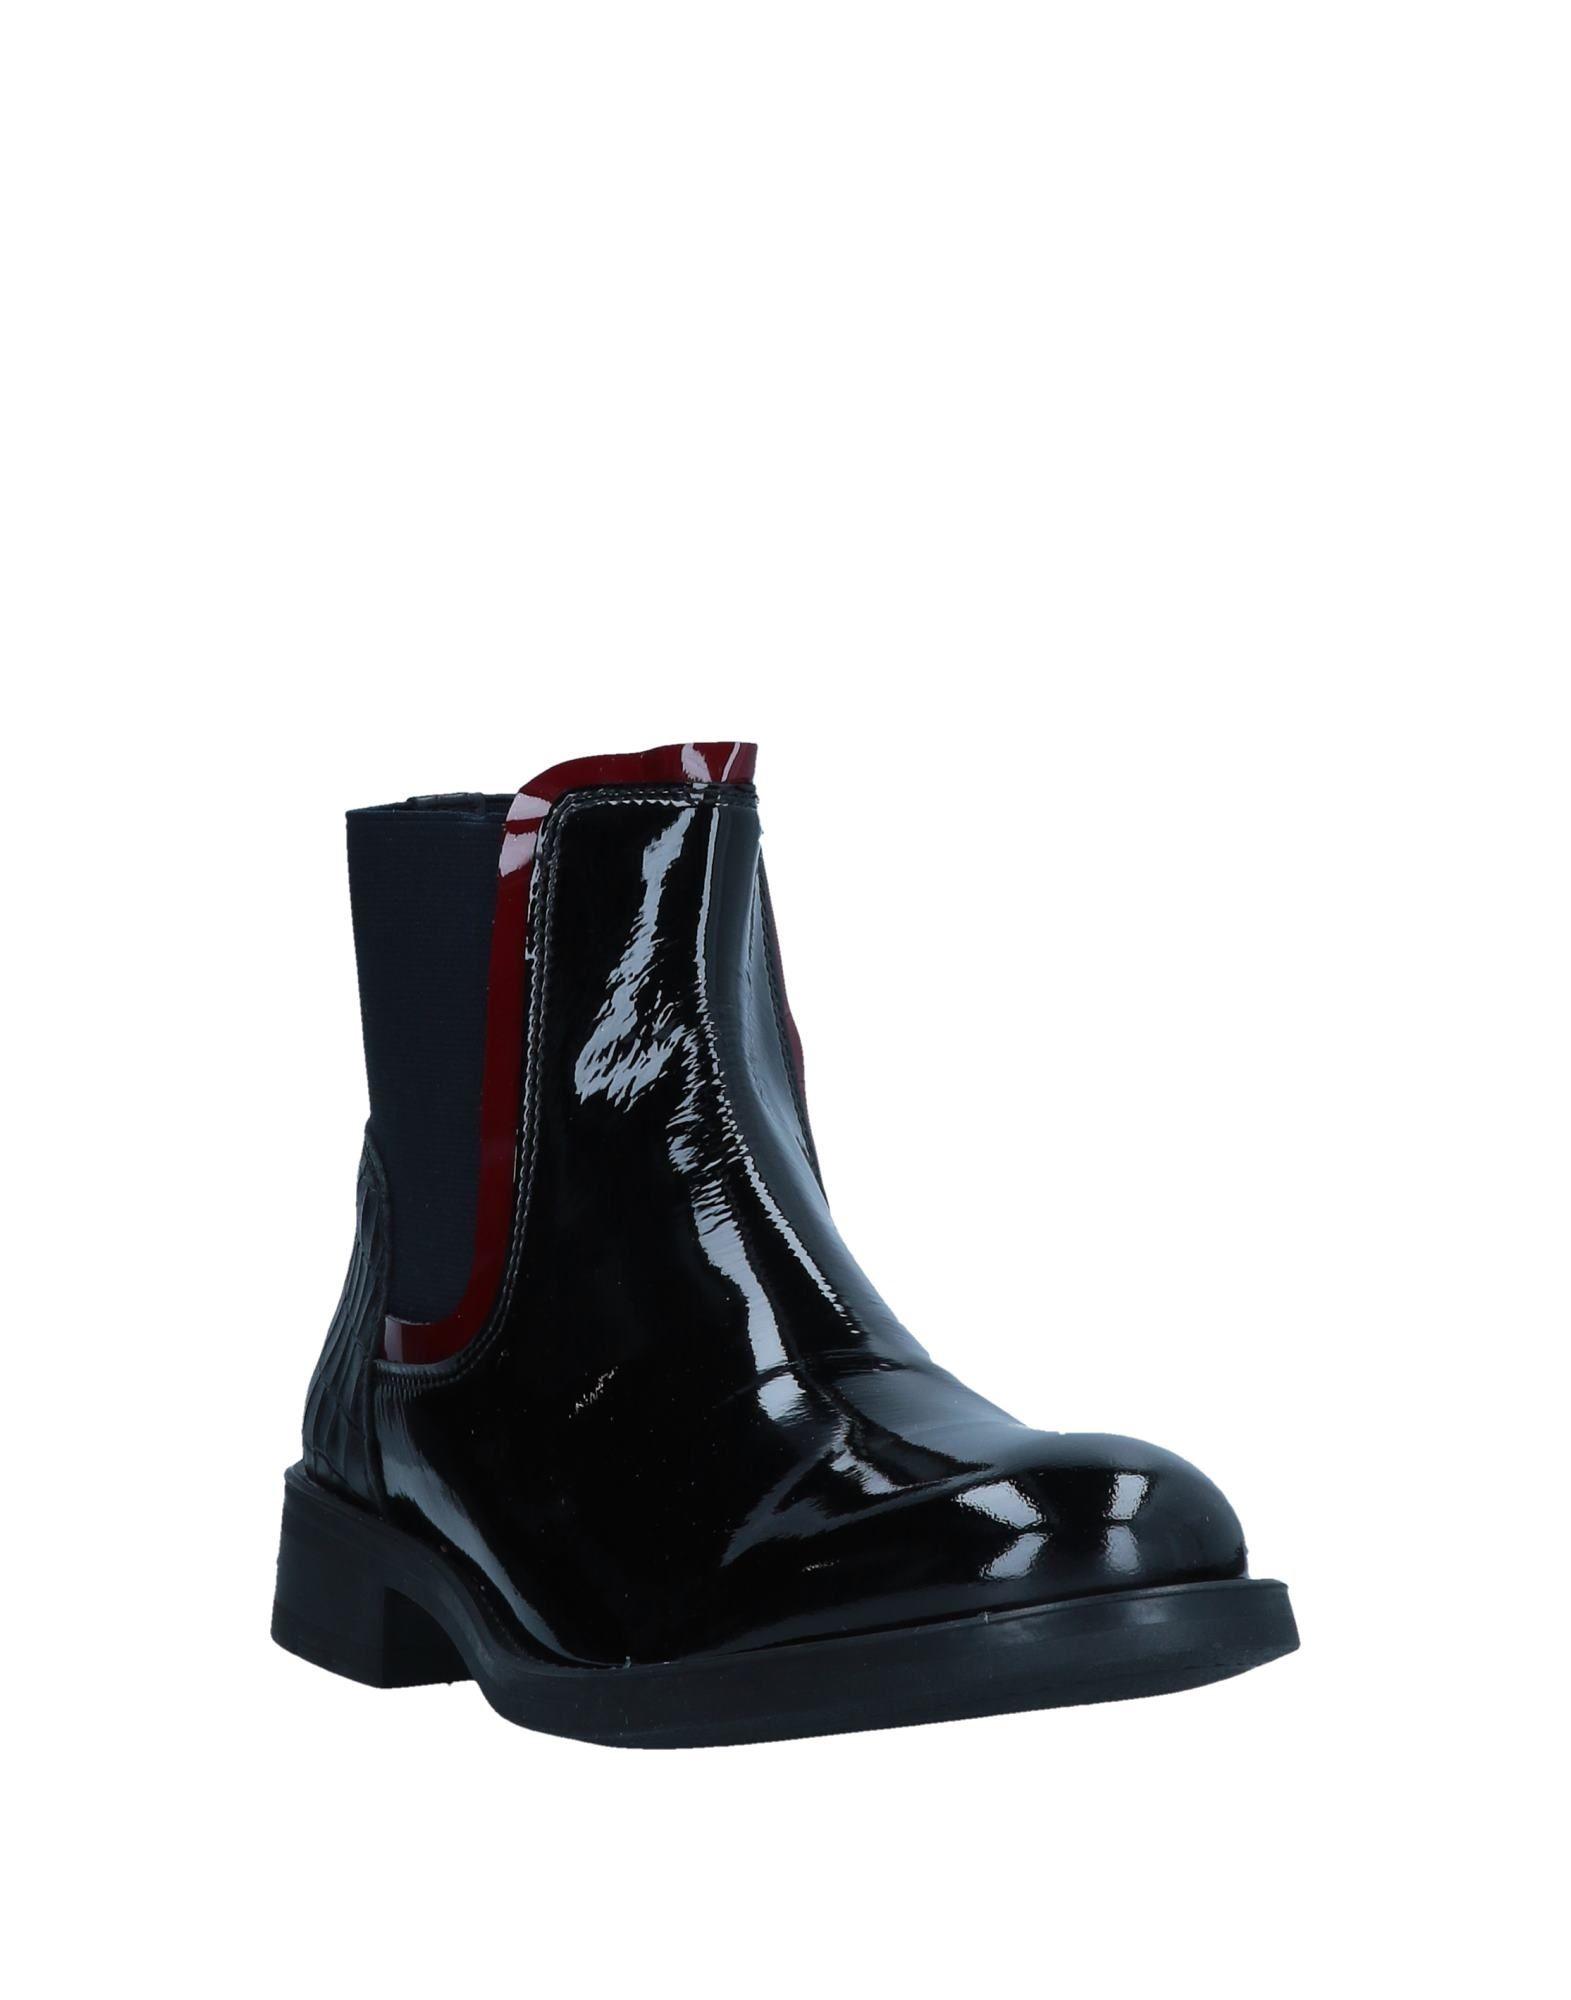 Gianfranco Lattanzi Ankle Boot - Women Gianfranco Lattanzi Lattanzi Lattanzi Ankle Boots online on  United Kingdom - 11551231PE 816e47